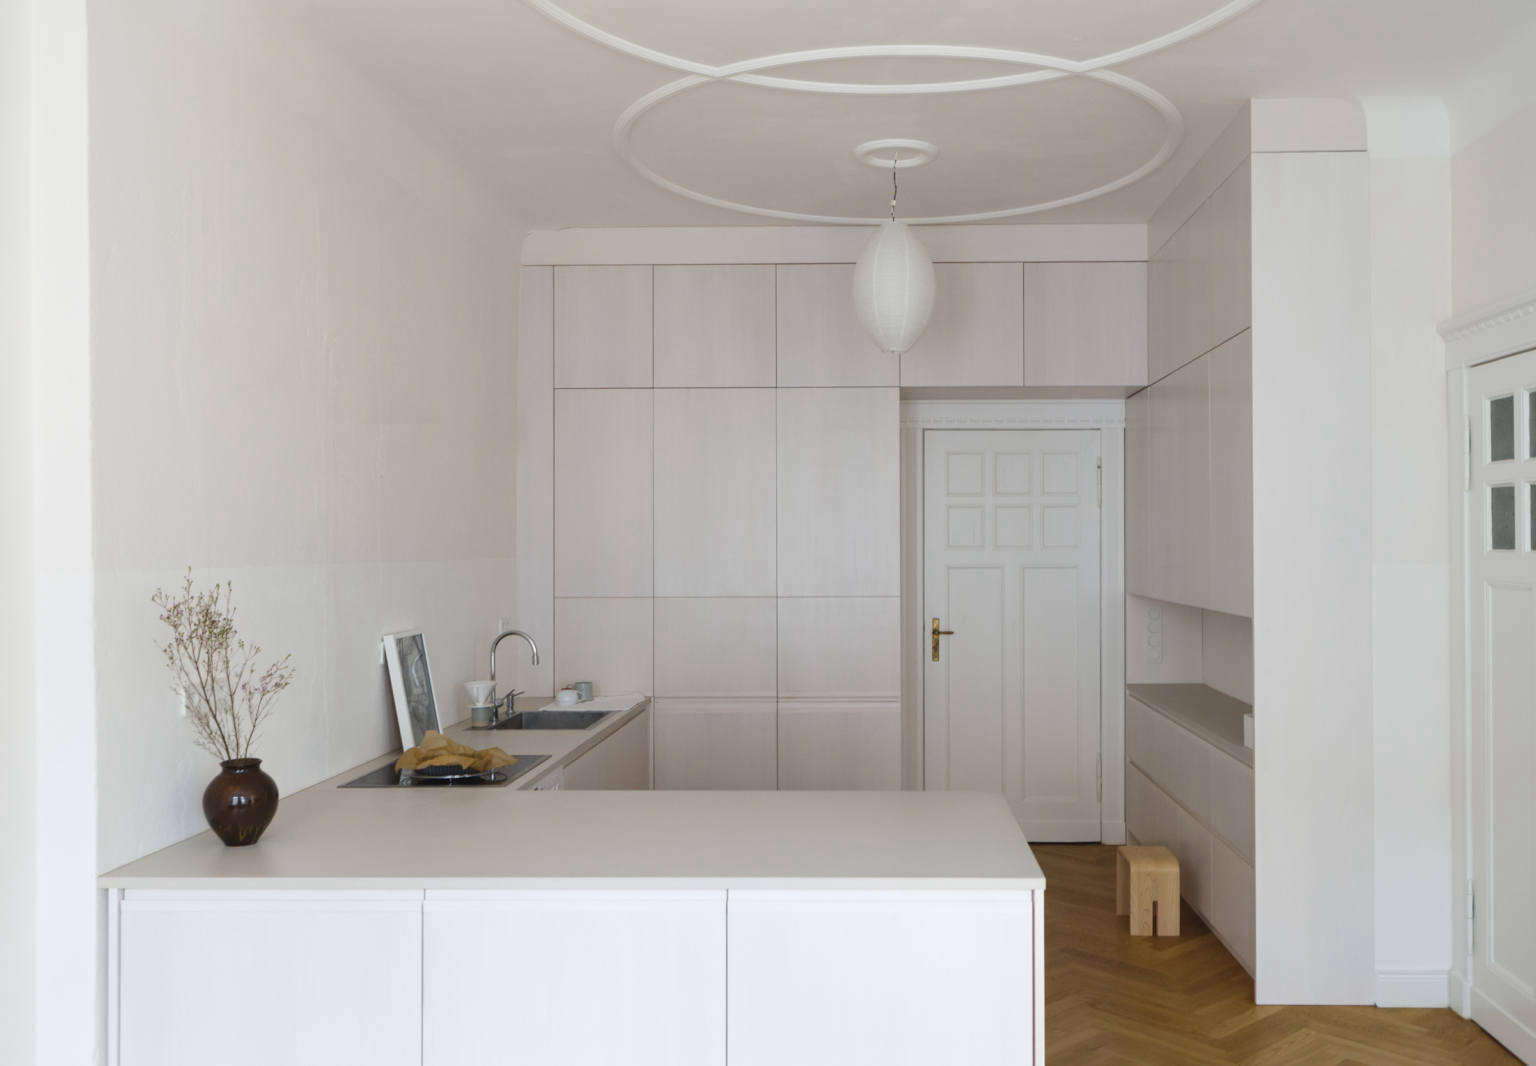 https://cdn.remodelista.com/wp-content/uploads/2018/03/berlin-apartment-kitchen-by-studio-oink-2-1536x1066.jpg